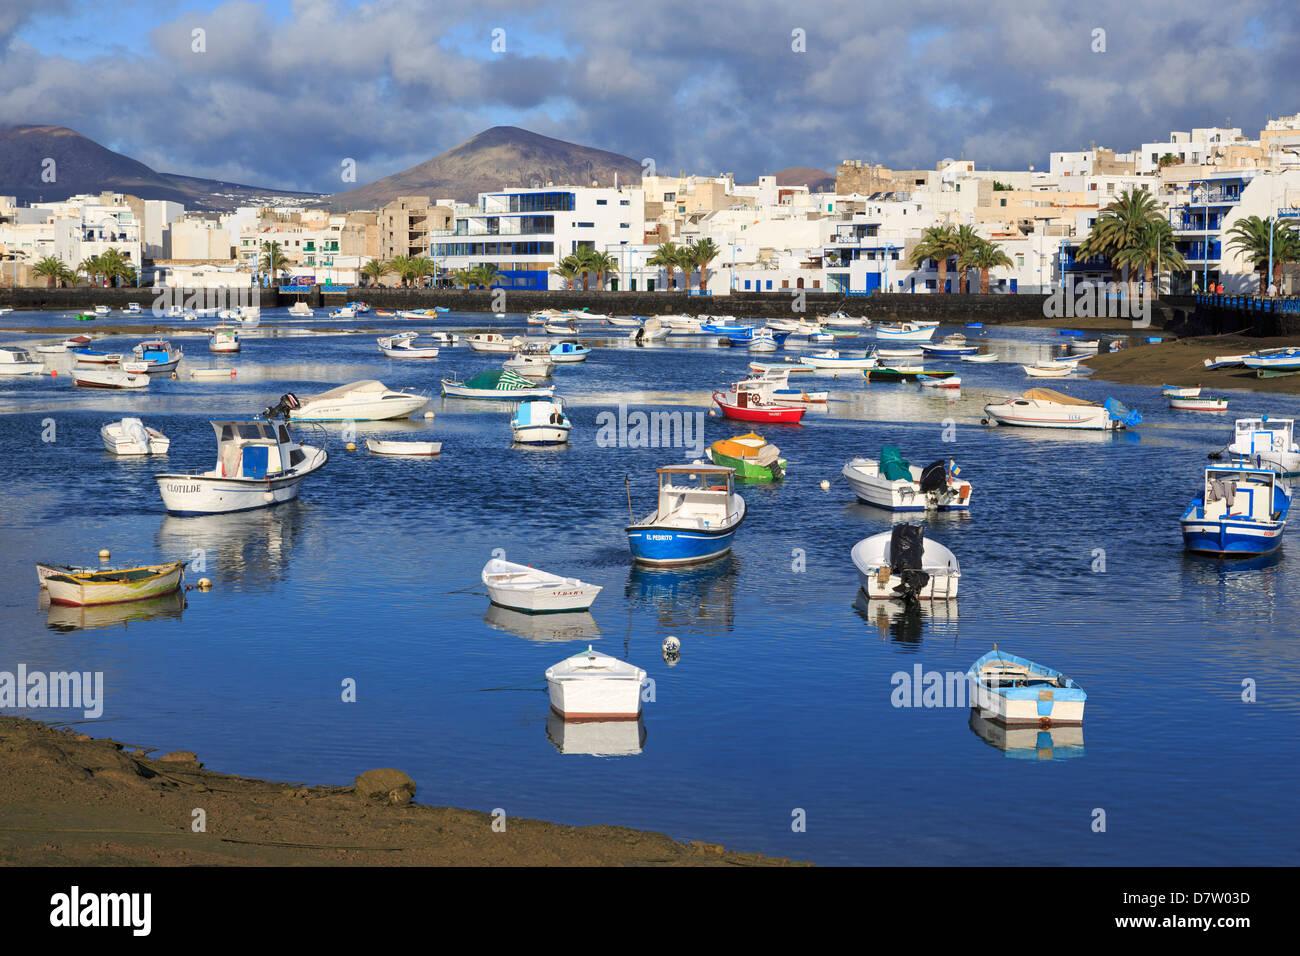 Fishing boats in Charco de San Gines, Arrecife, Lanzarote Island, Canary Islands, Spain, Atlantic - Stock Image